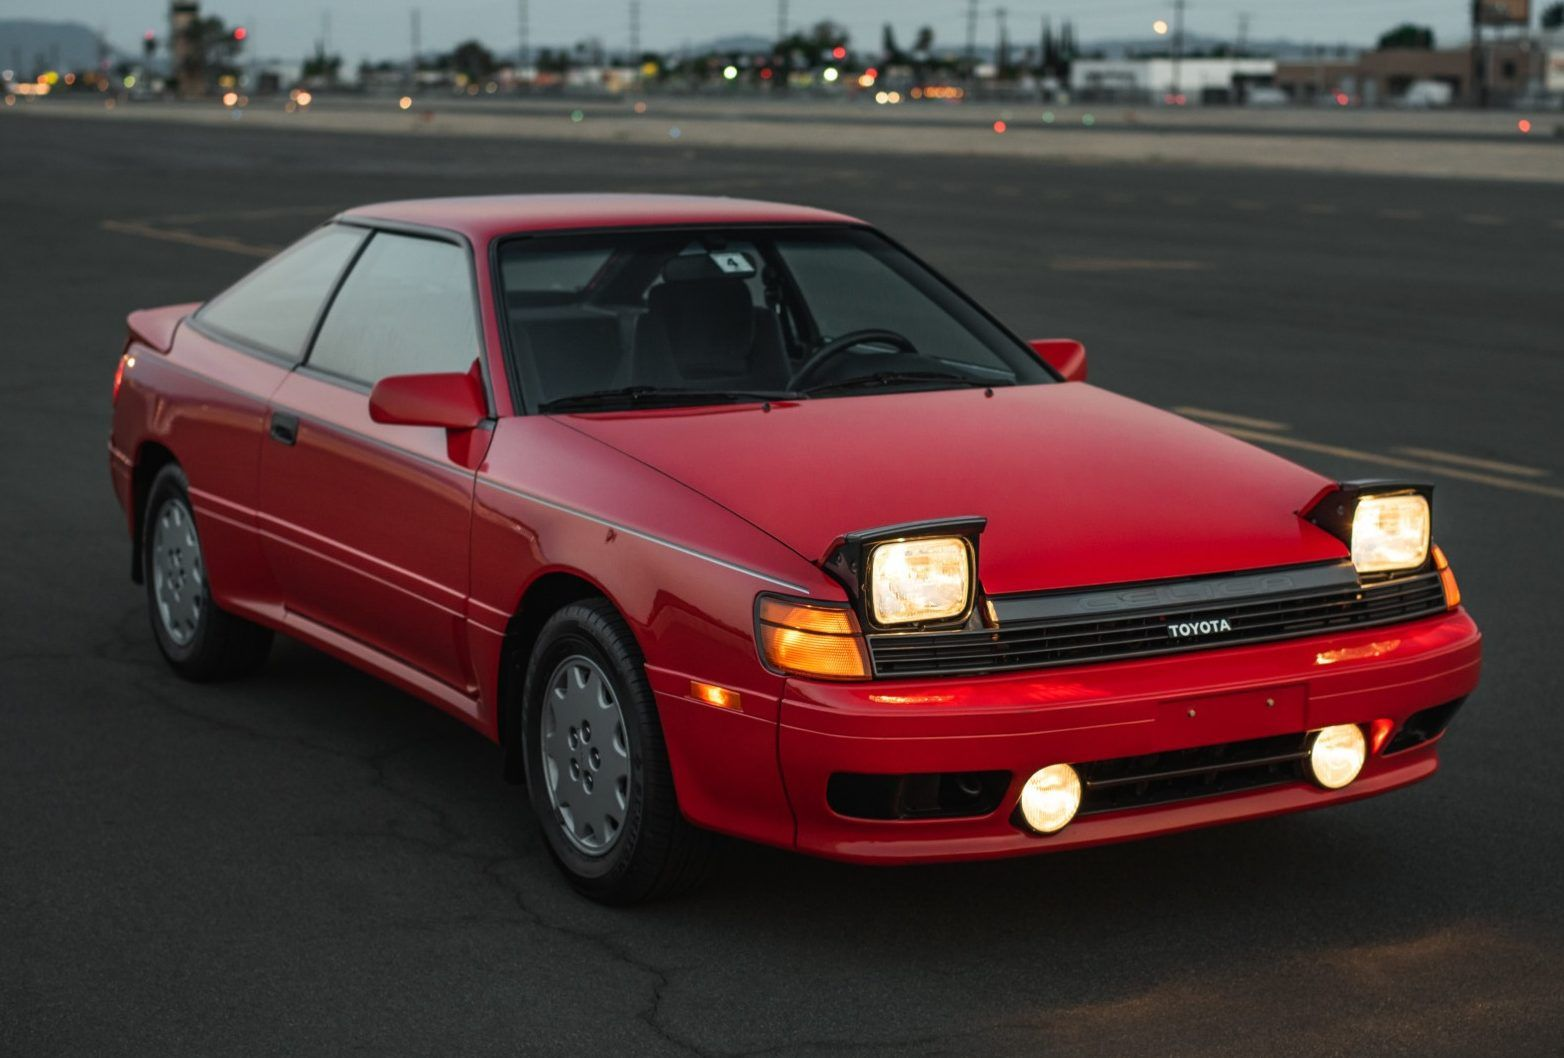 Kelebihan Toyota Celica Perbandingan Harga